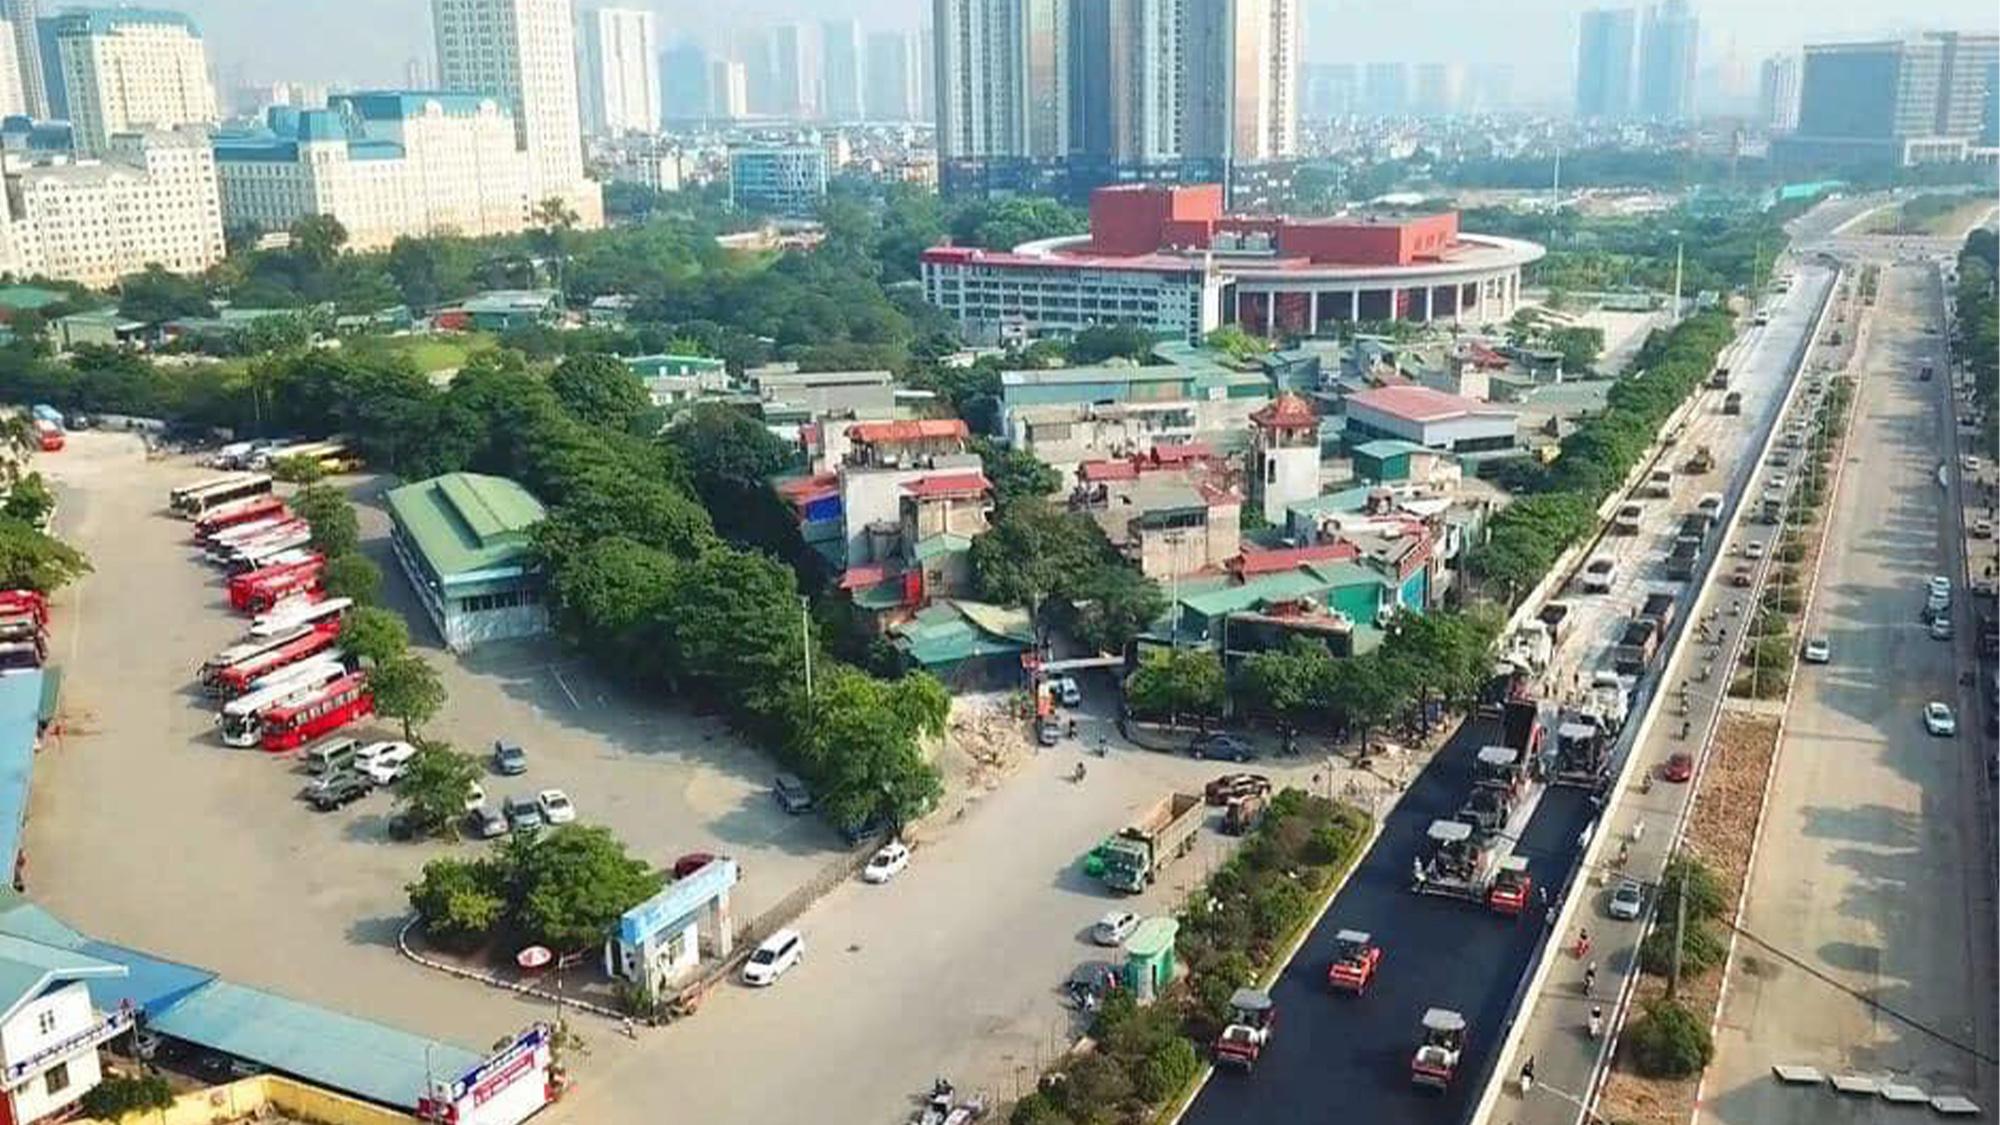 Resurfacing work on the Hanoi Street circuit for the Vietnam Grand Prix